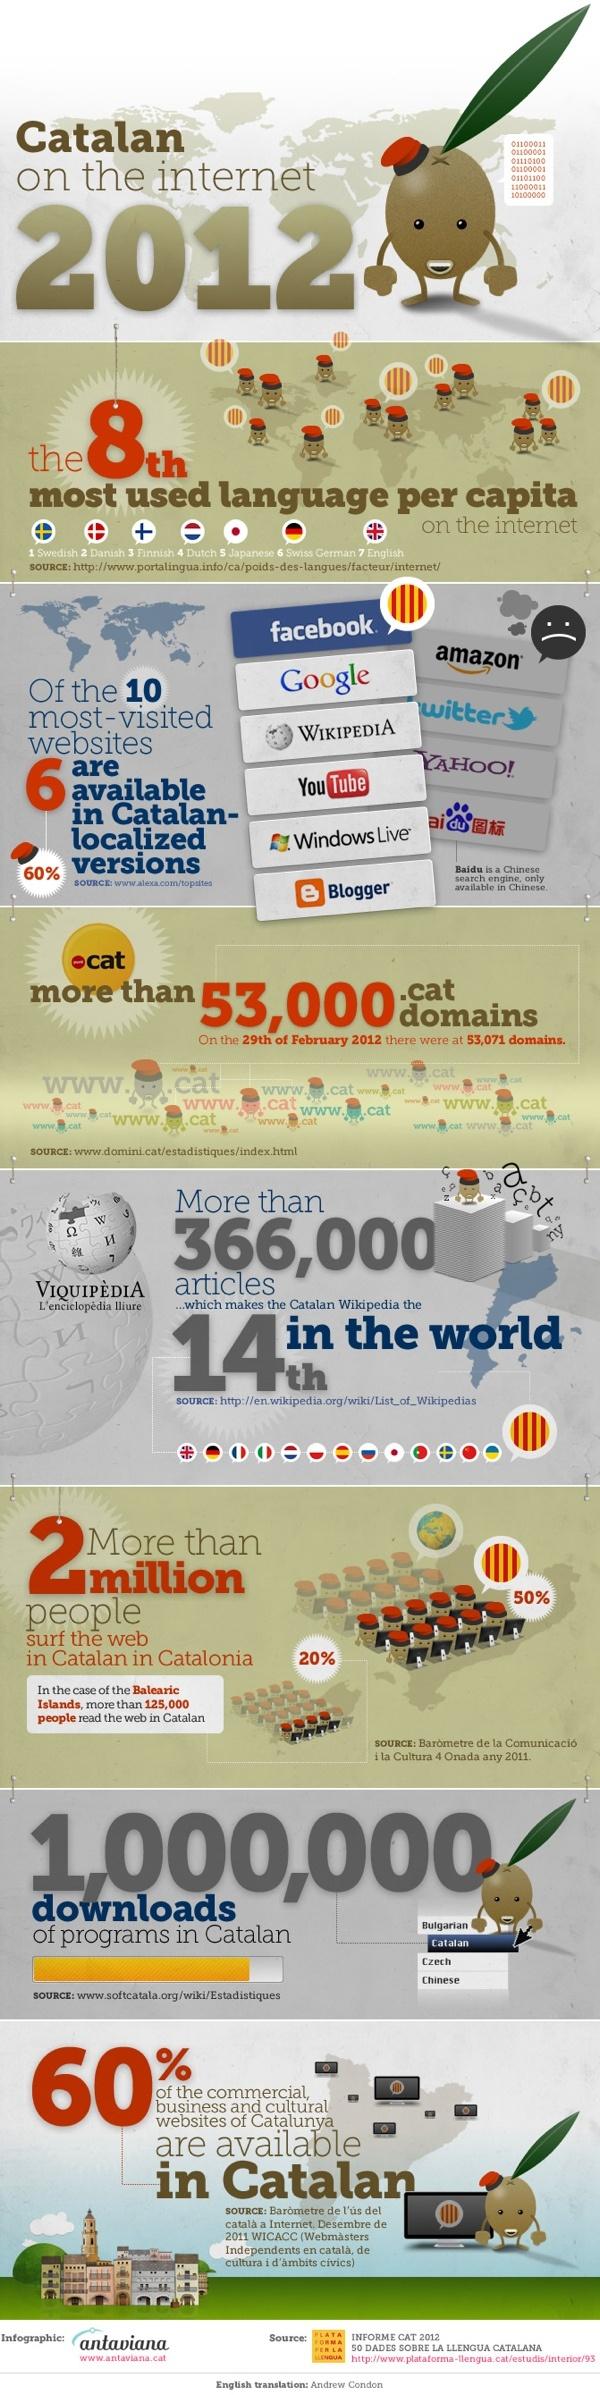 Catalan language on the Internet